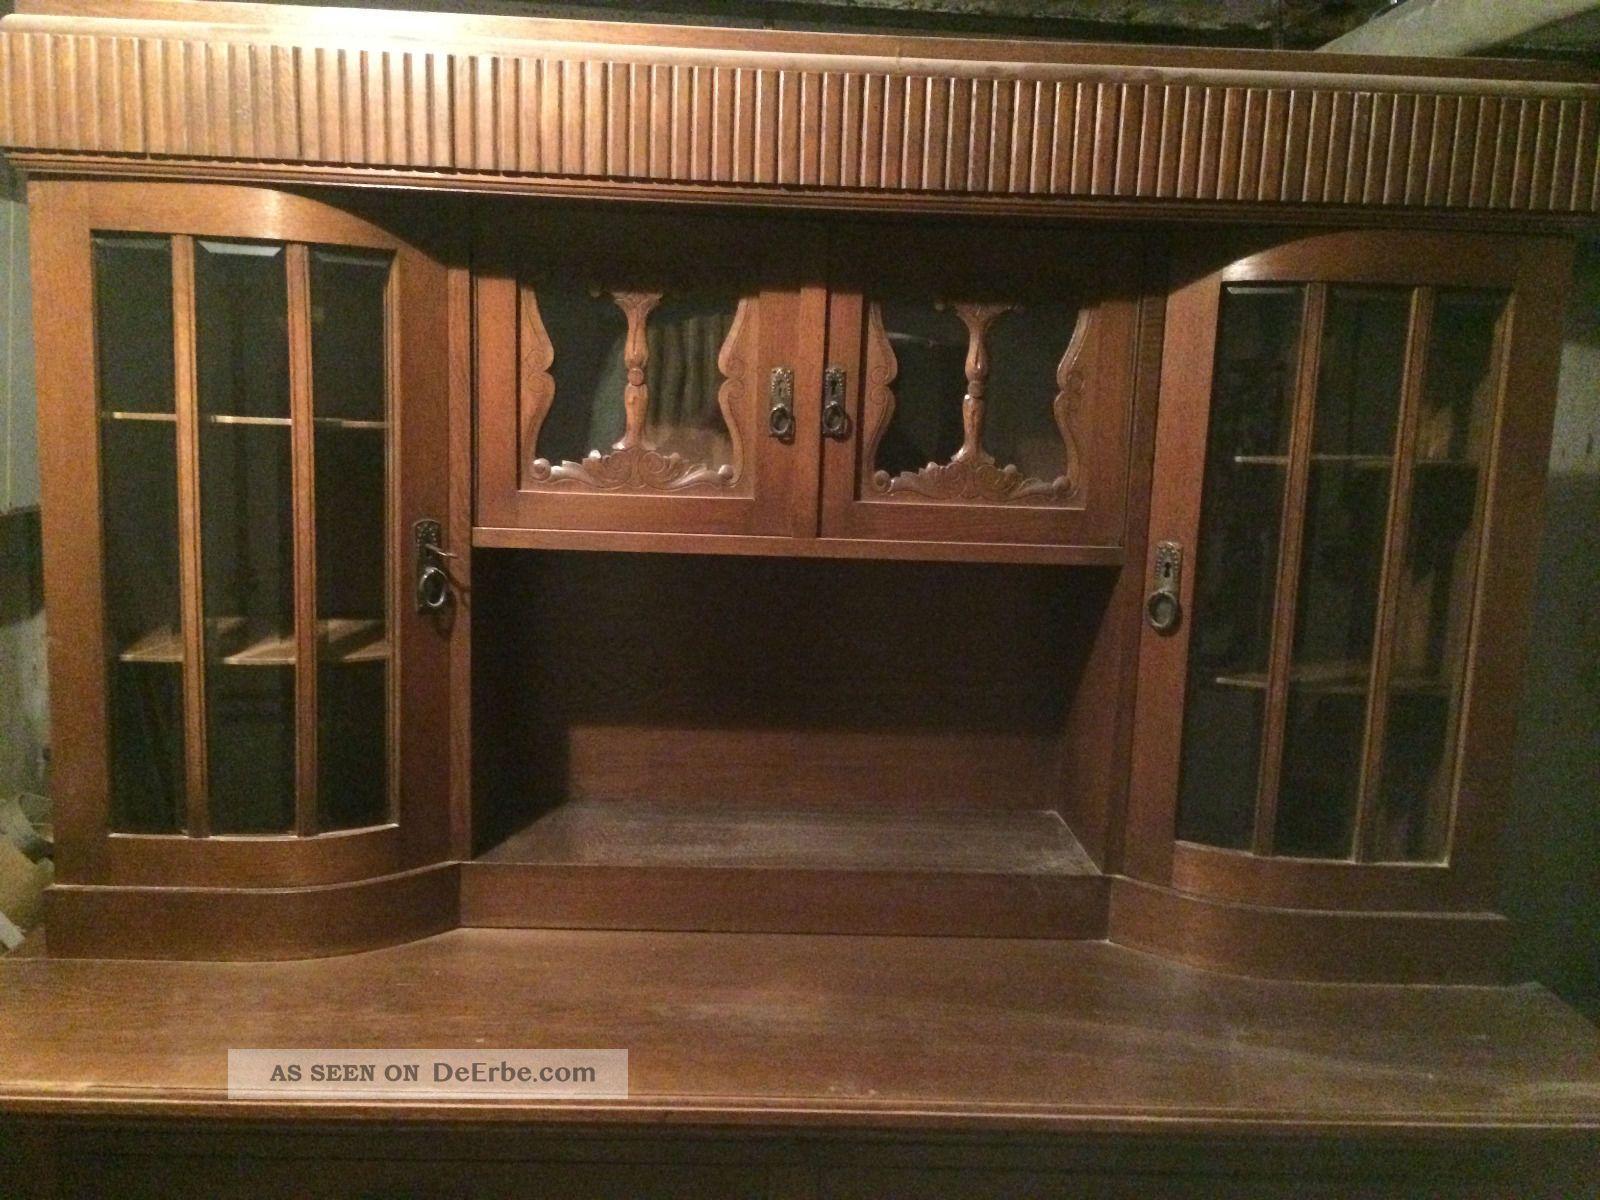 82 antikes wohnzimmer buffet tolles antikes - Antike moebel epochen merkmale ...